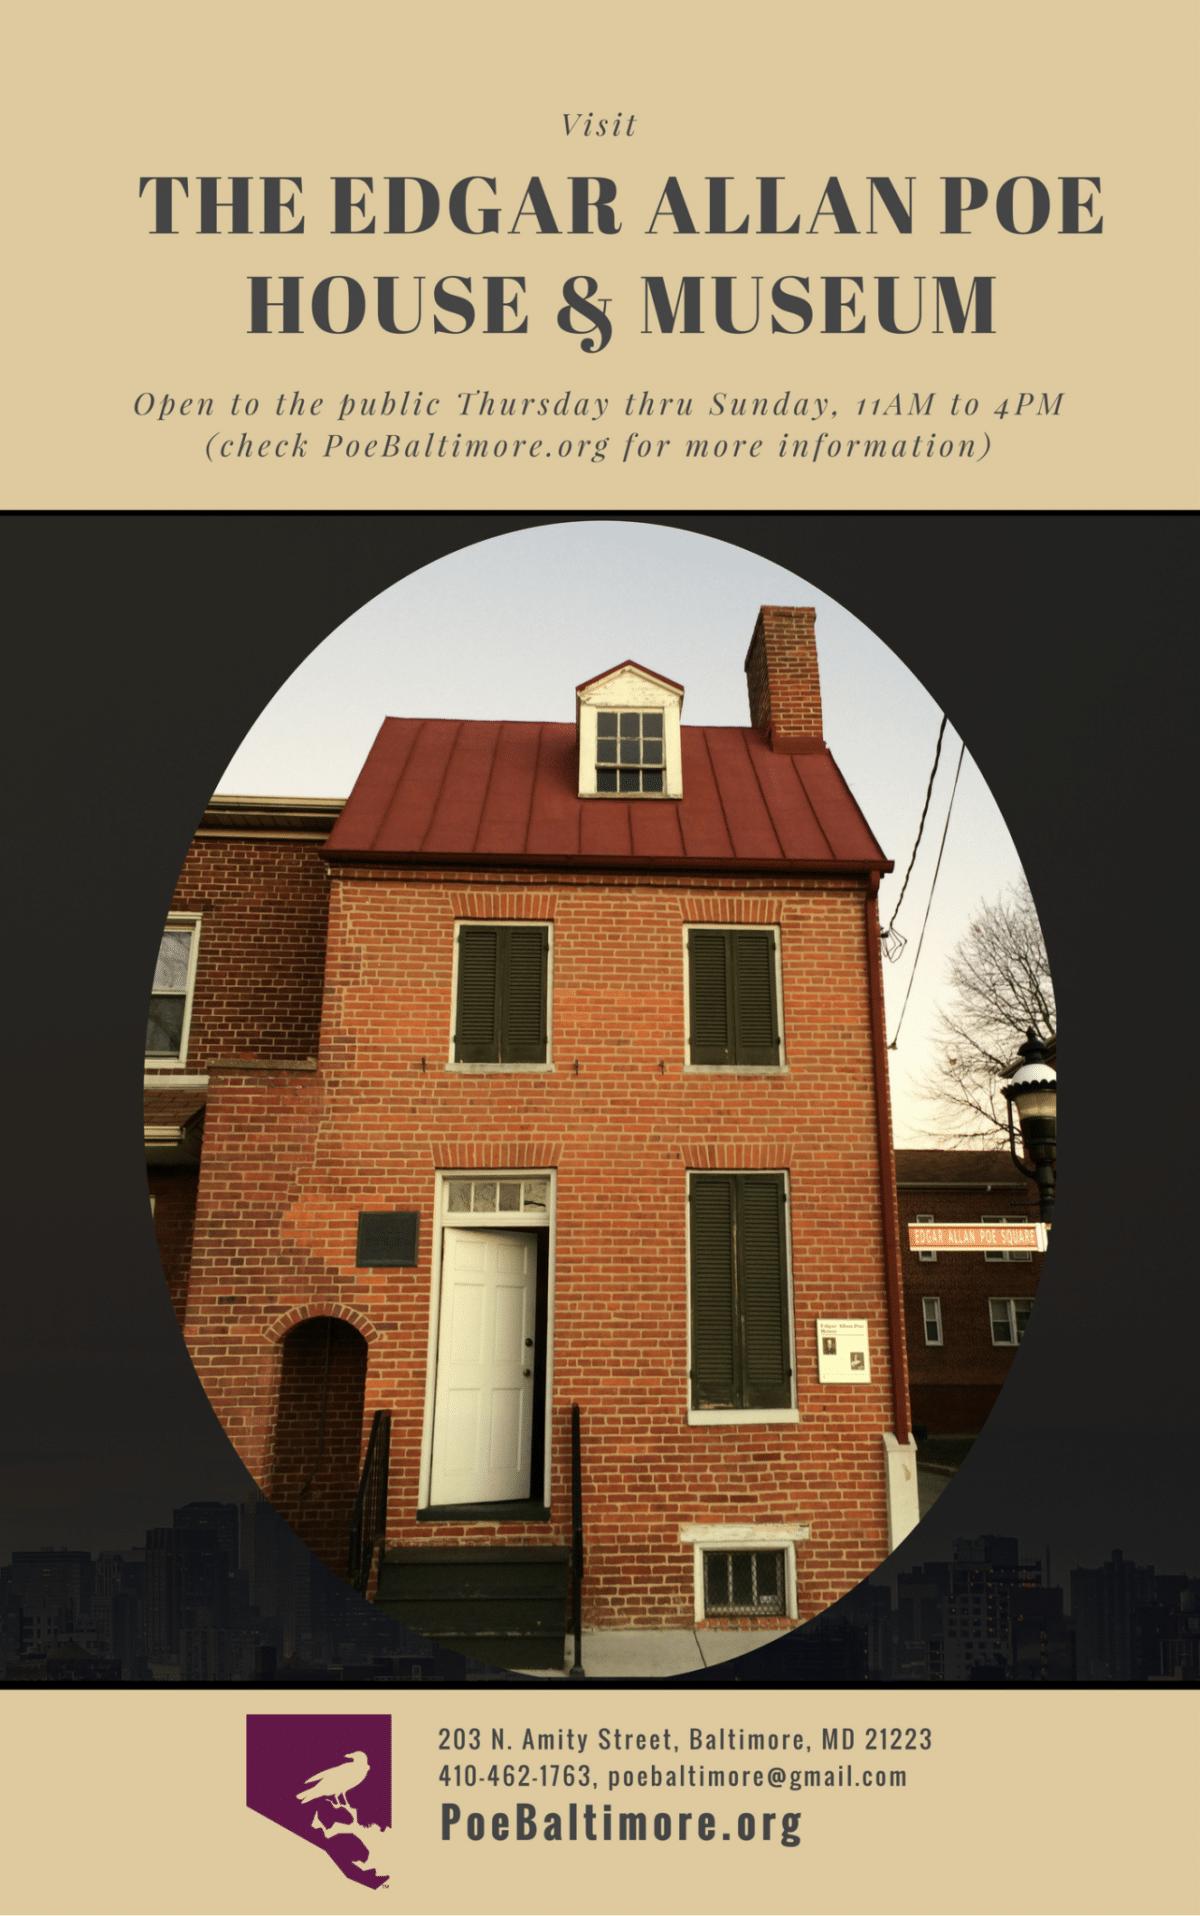 Visit Edgar Allan Poe House